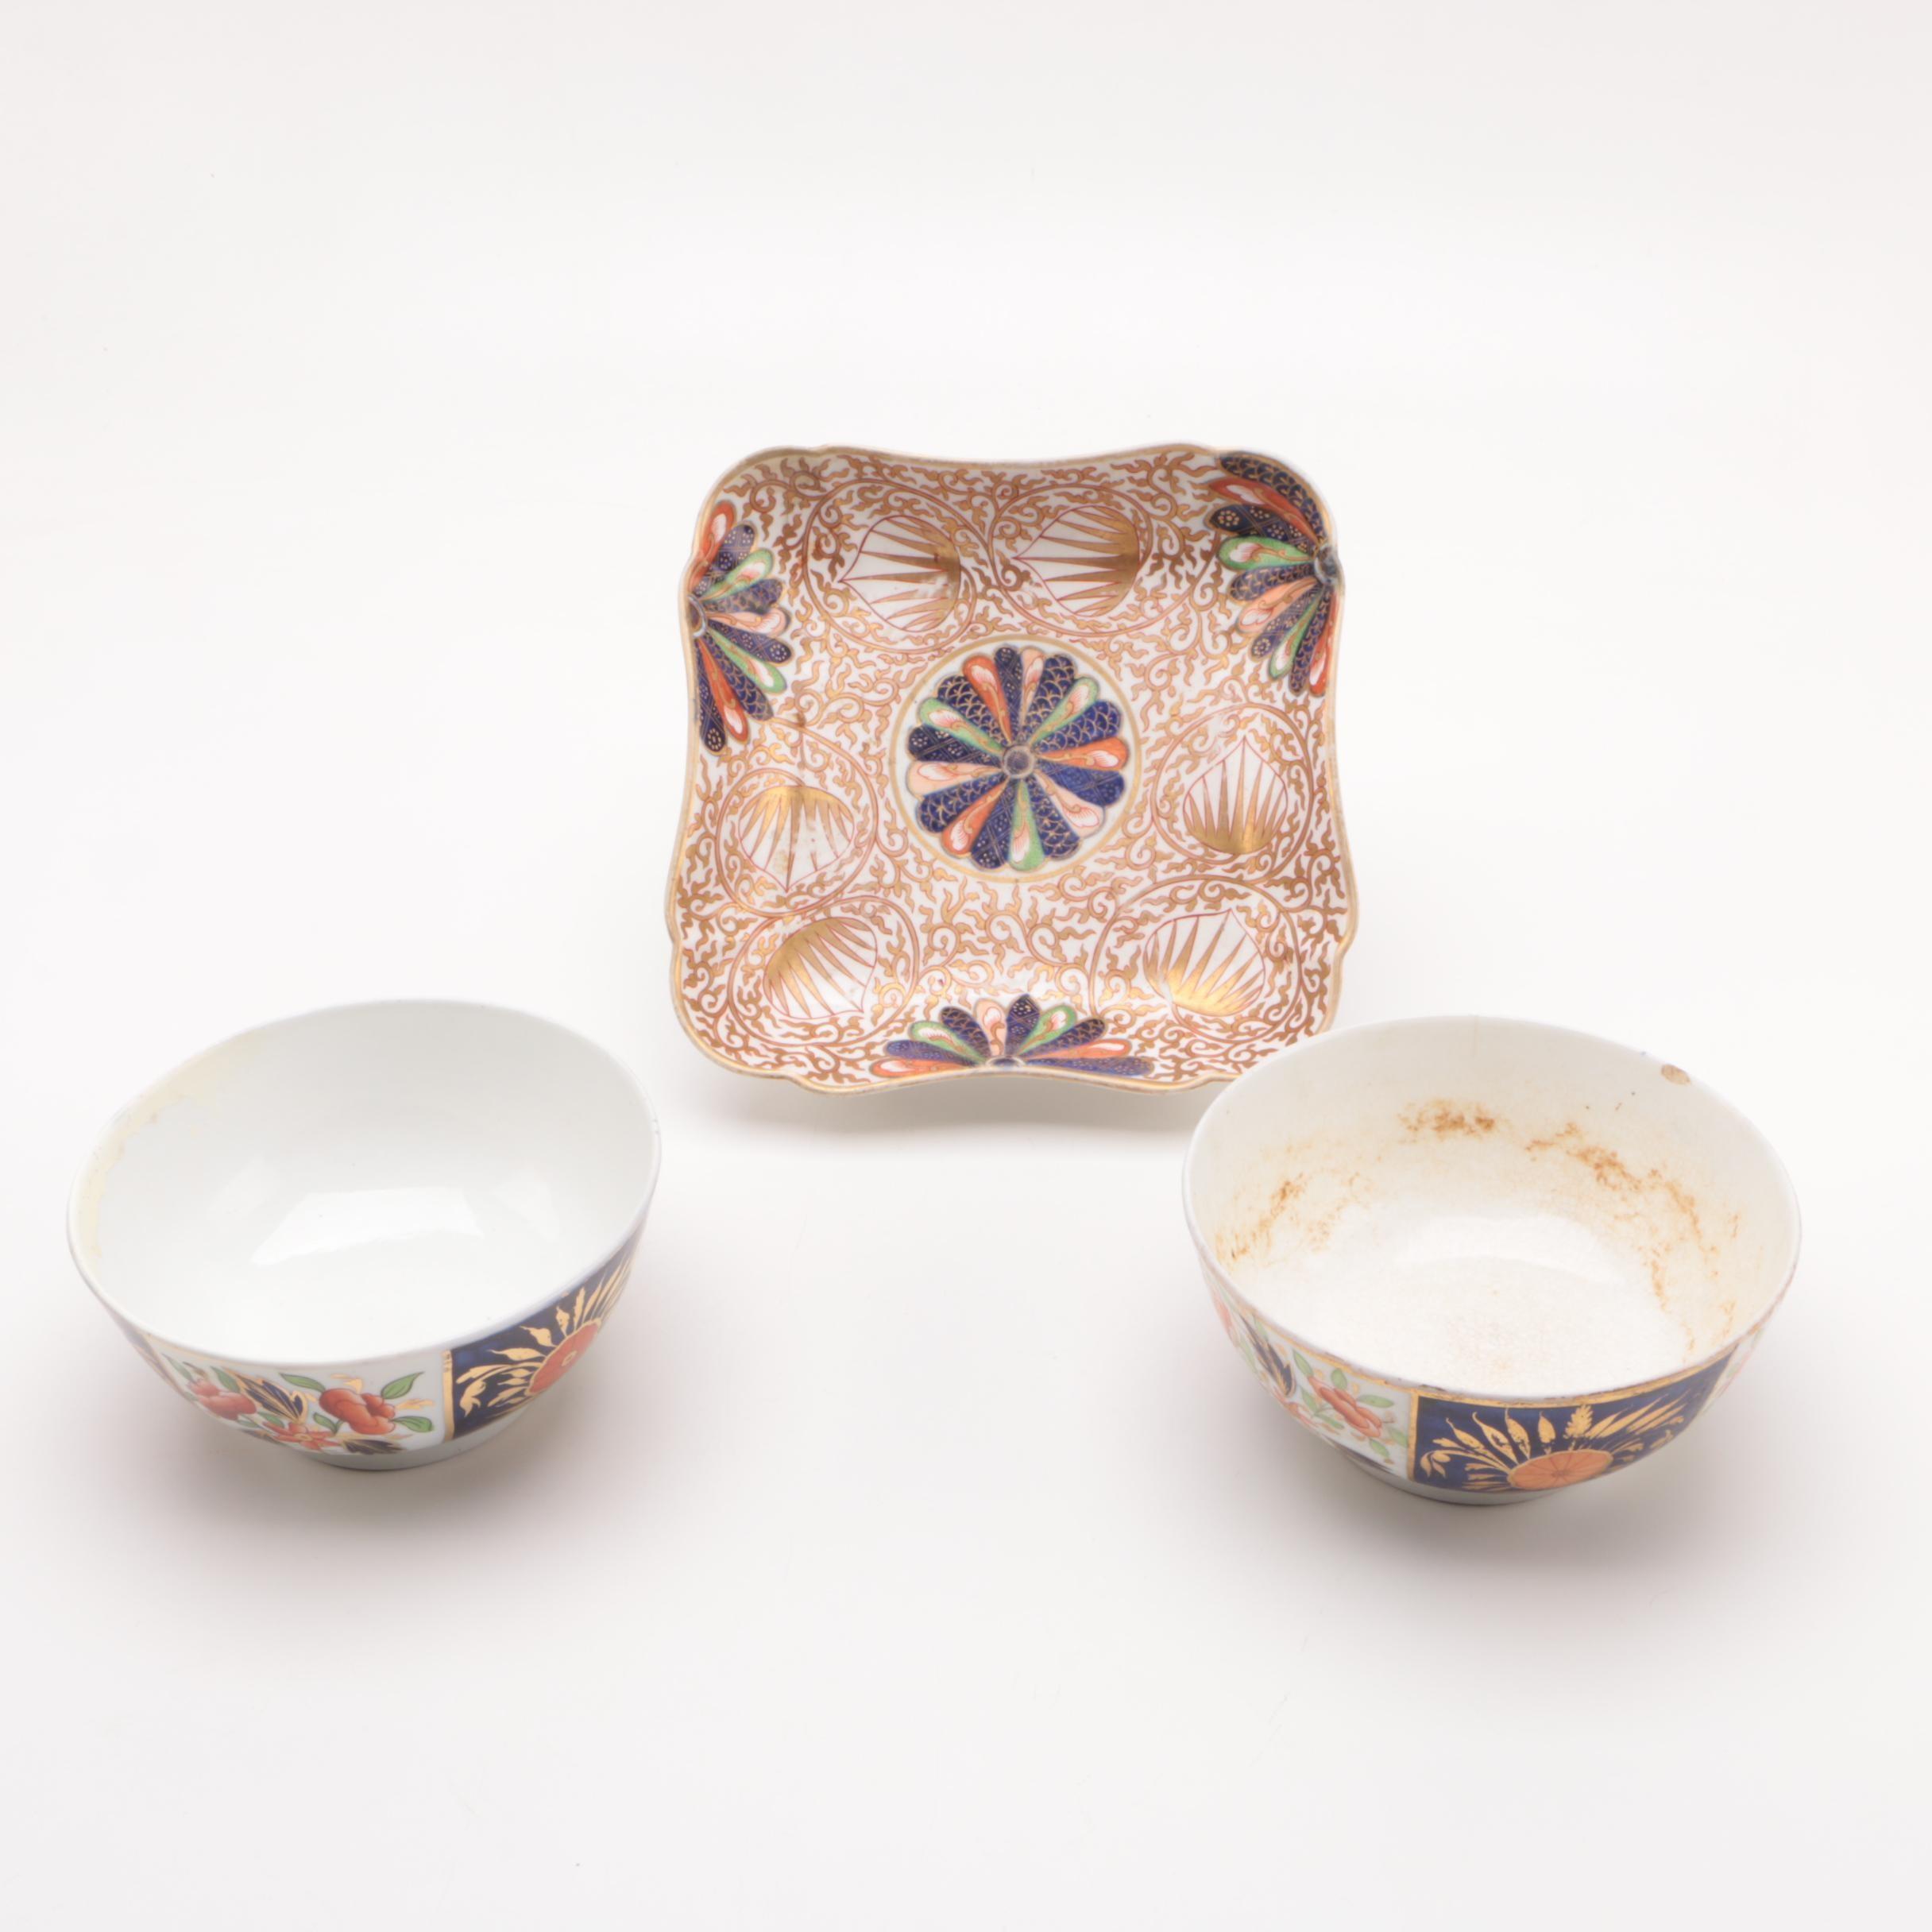 Imari Style Porcelain Tableware